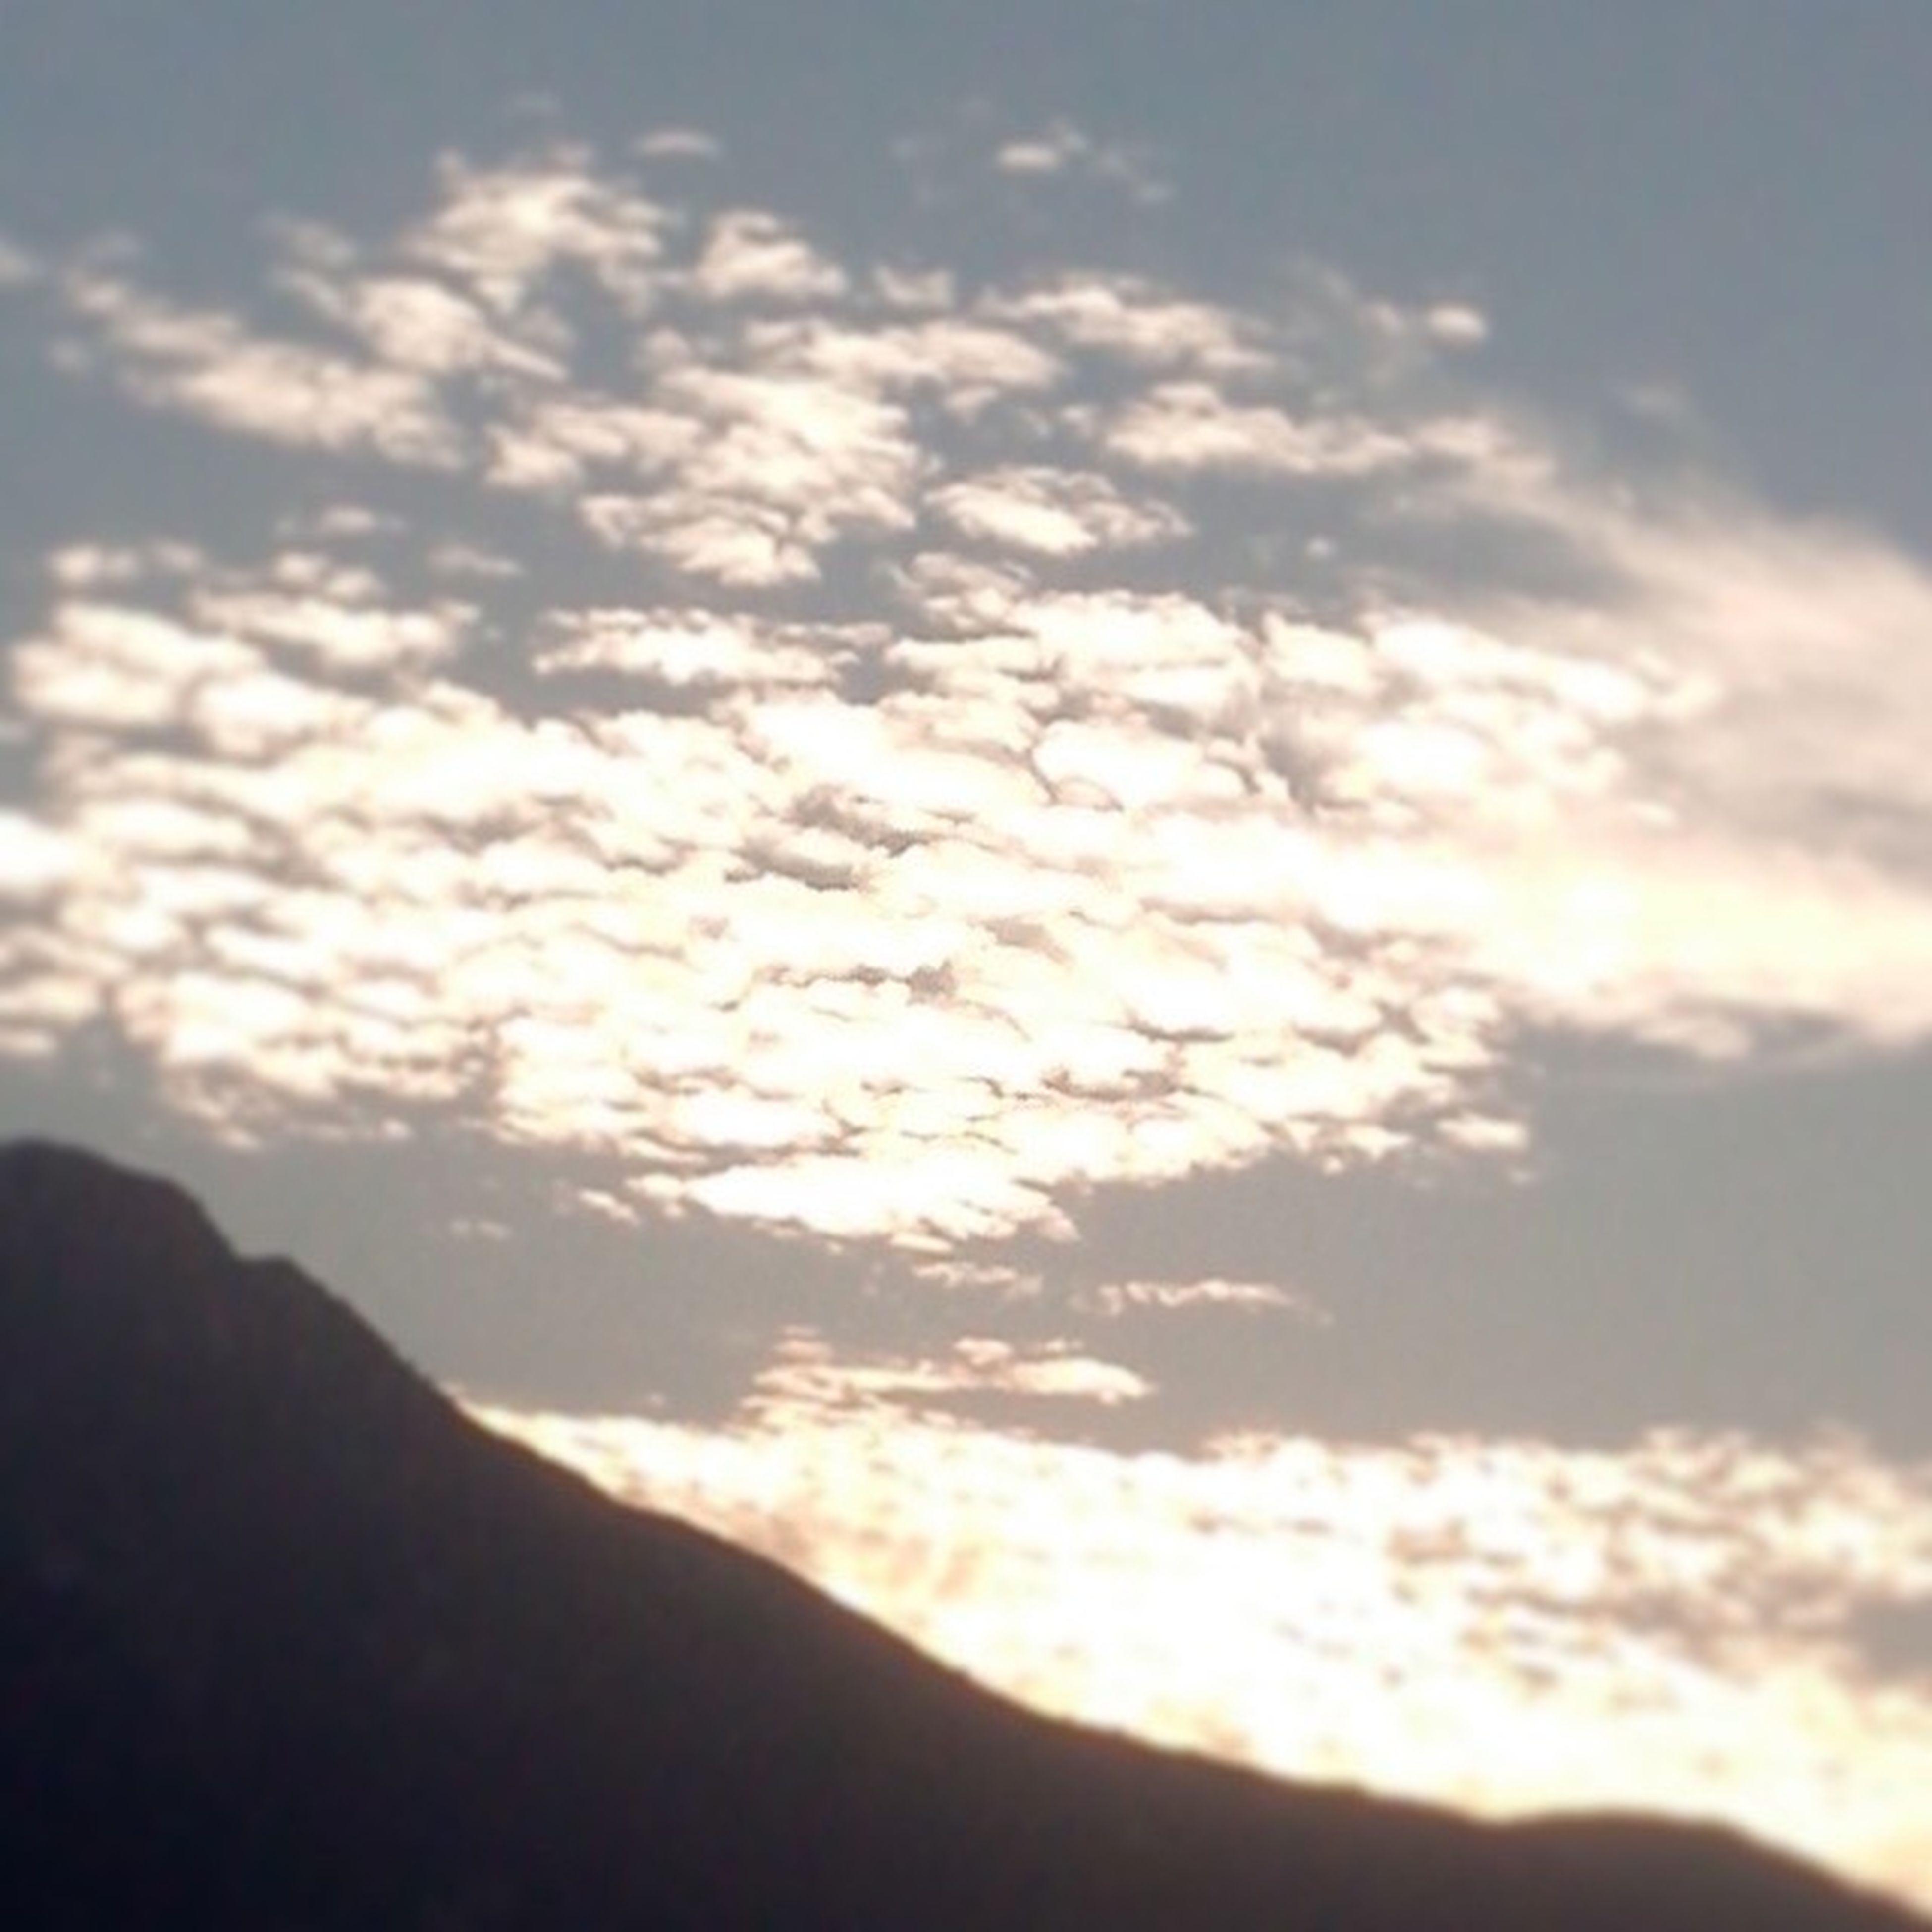 sky, tranquil scene, tranquility, scenics, beauty in nature, cloud - sky, sunset, silhouette, nature, mountain, cloud, cloudy, idyllic, outdoors, landscape, non-urban scene, no people, majestic, sunlight, non urban scene